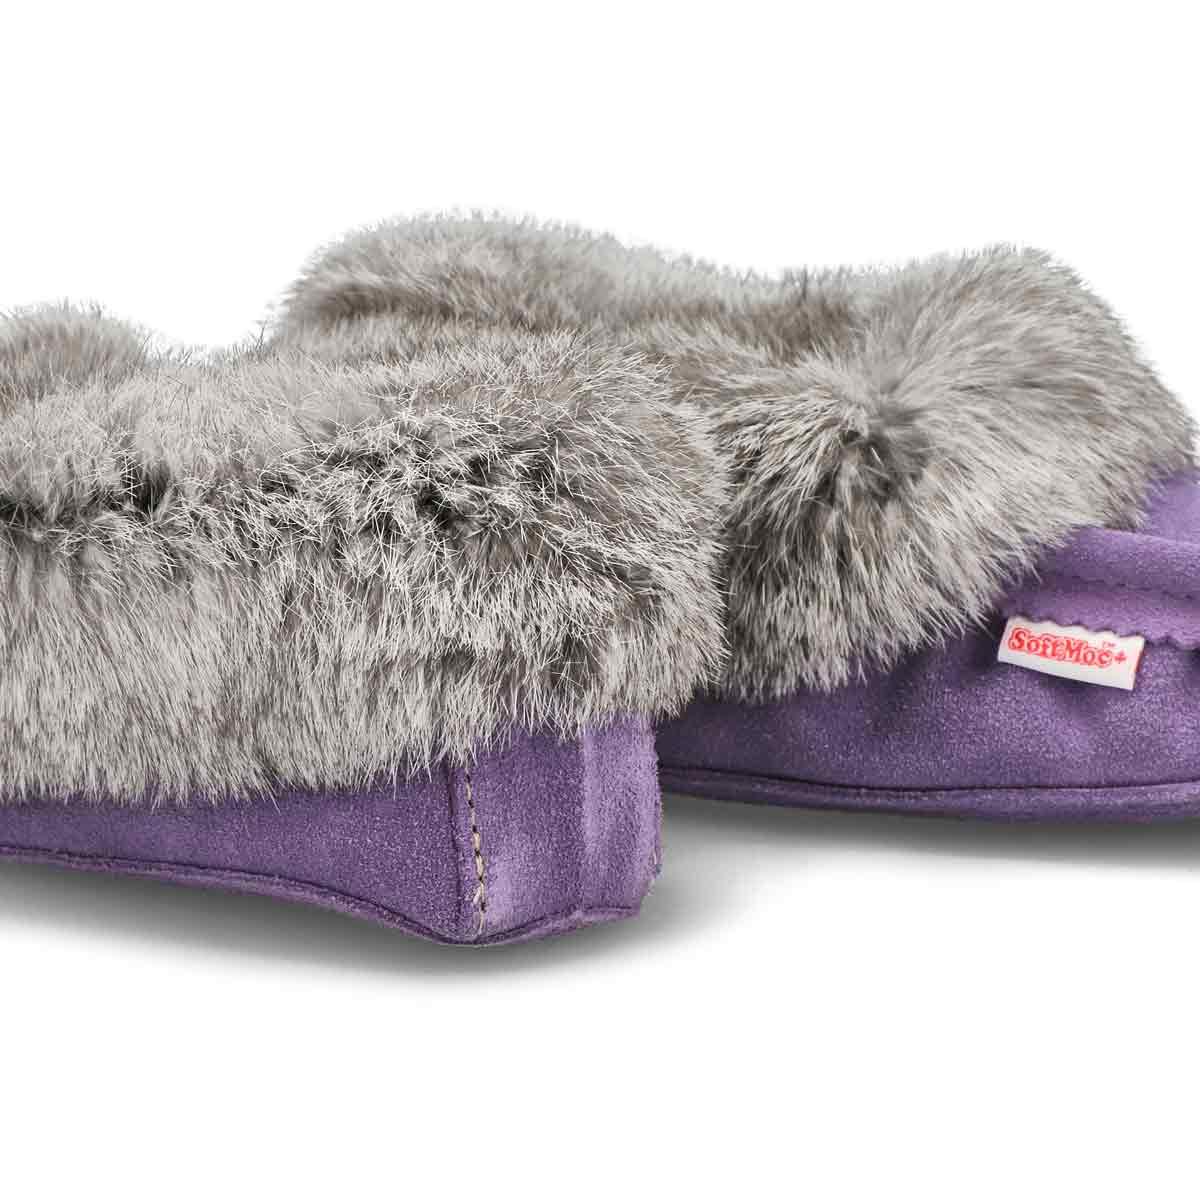 Women's SF600 Rabbit Fur Moccasin - Lavender